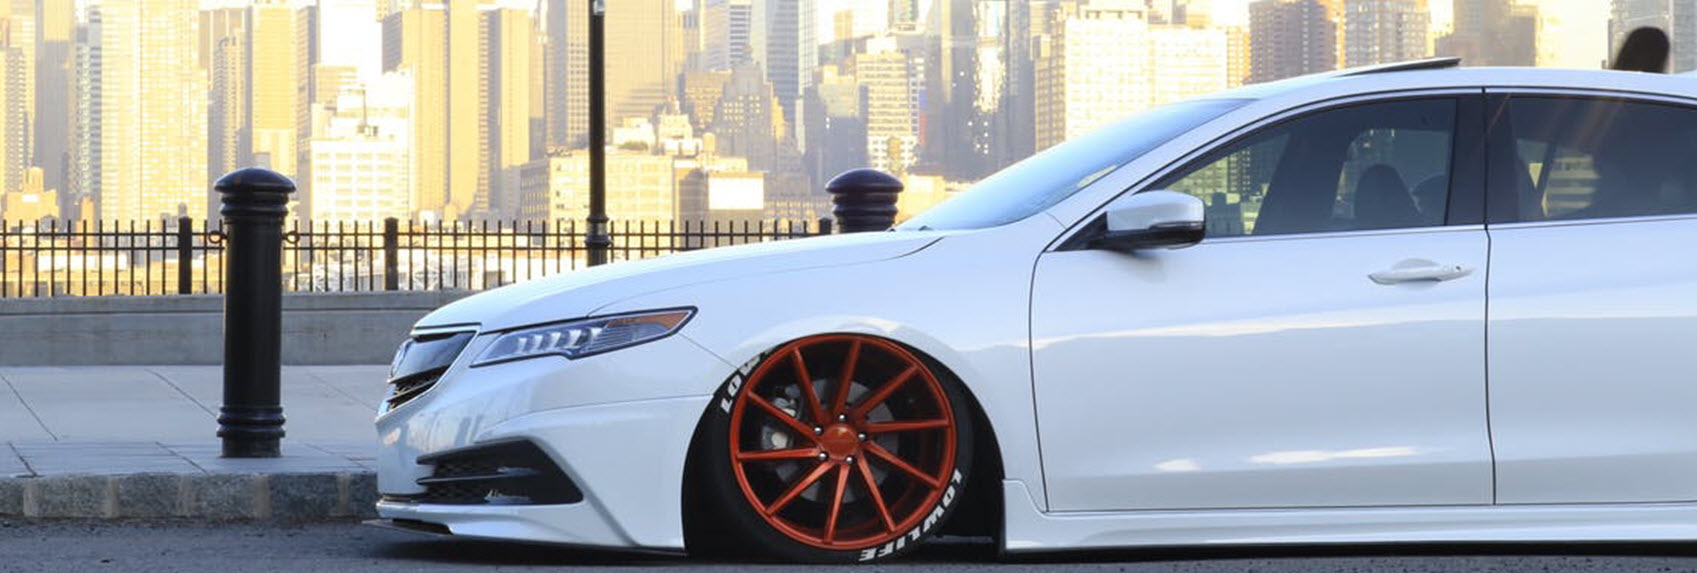 white-car-modifications